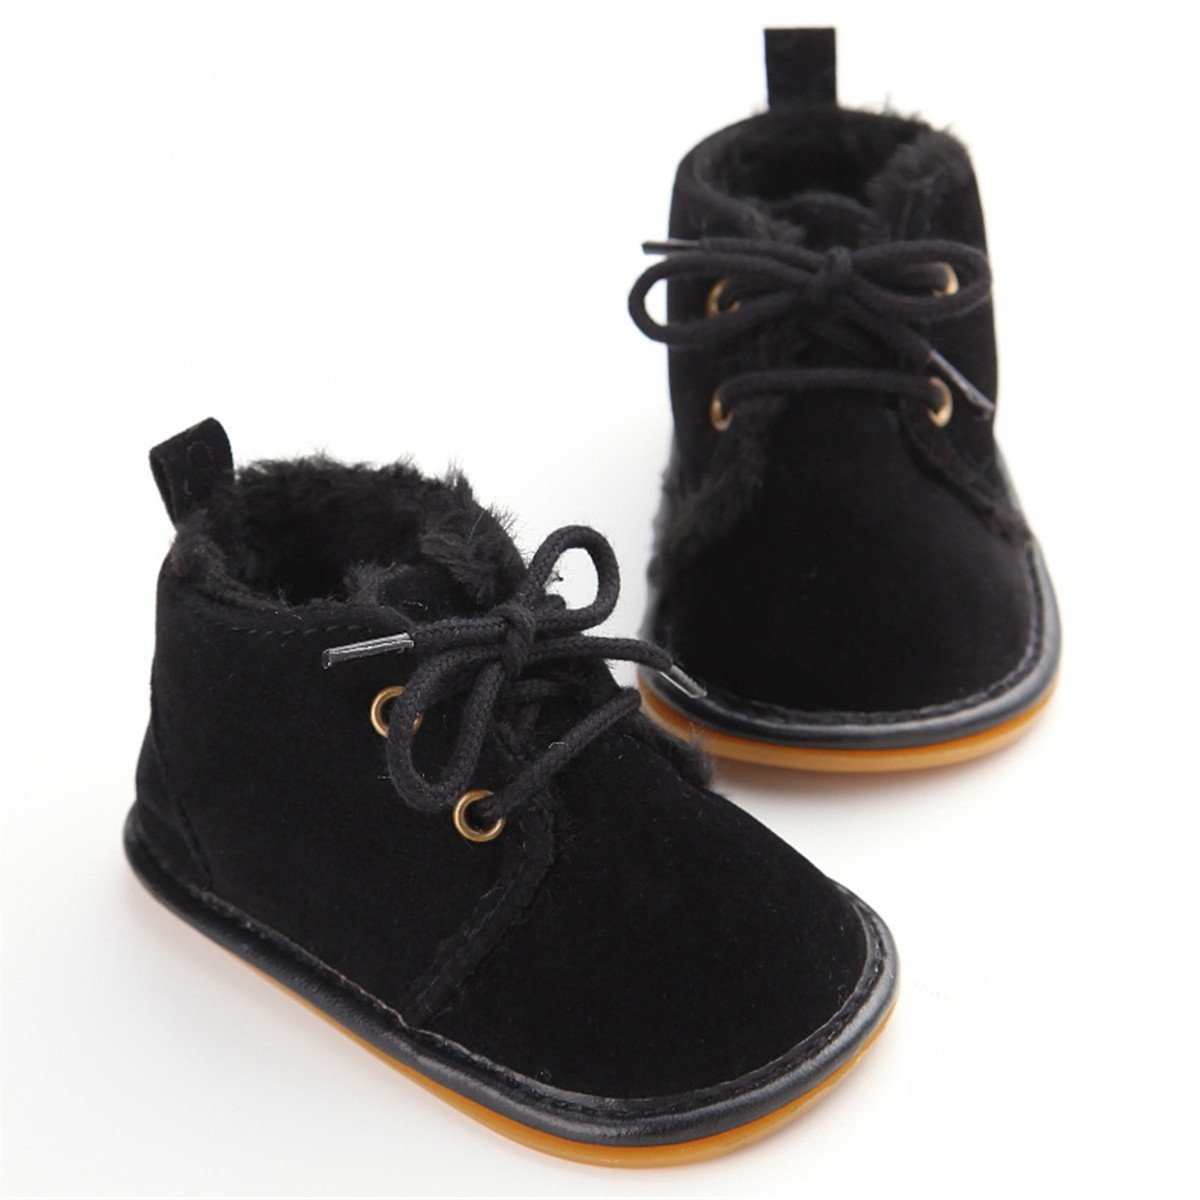 Sabe Winter Newborn Unisex Baby Girls Boys Velvet Rubber Sole Anit-slip Shoes Prewalker Boots (6-12 month, Black)